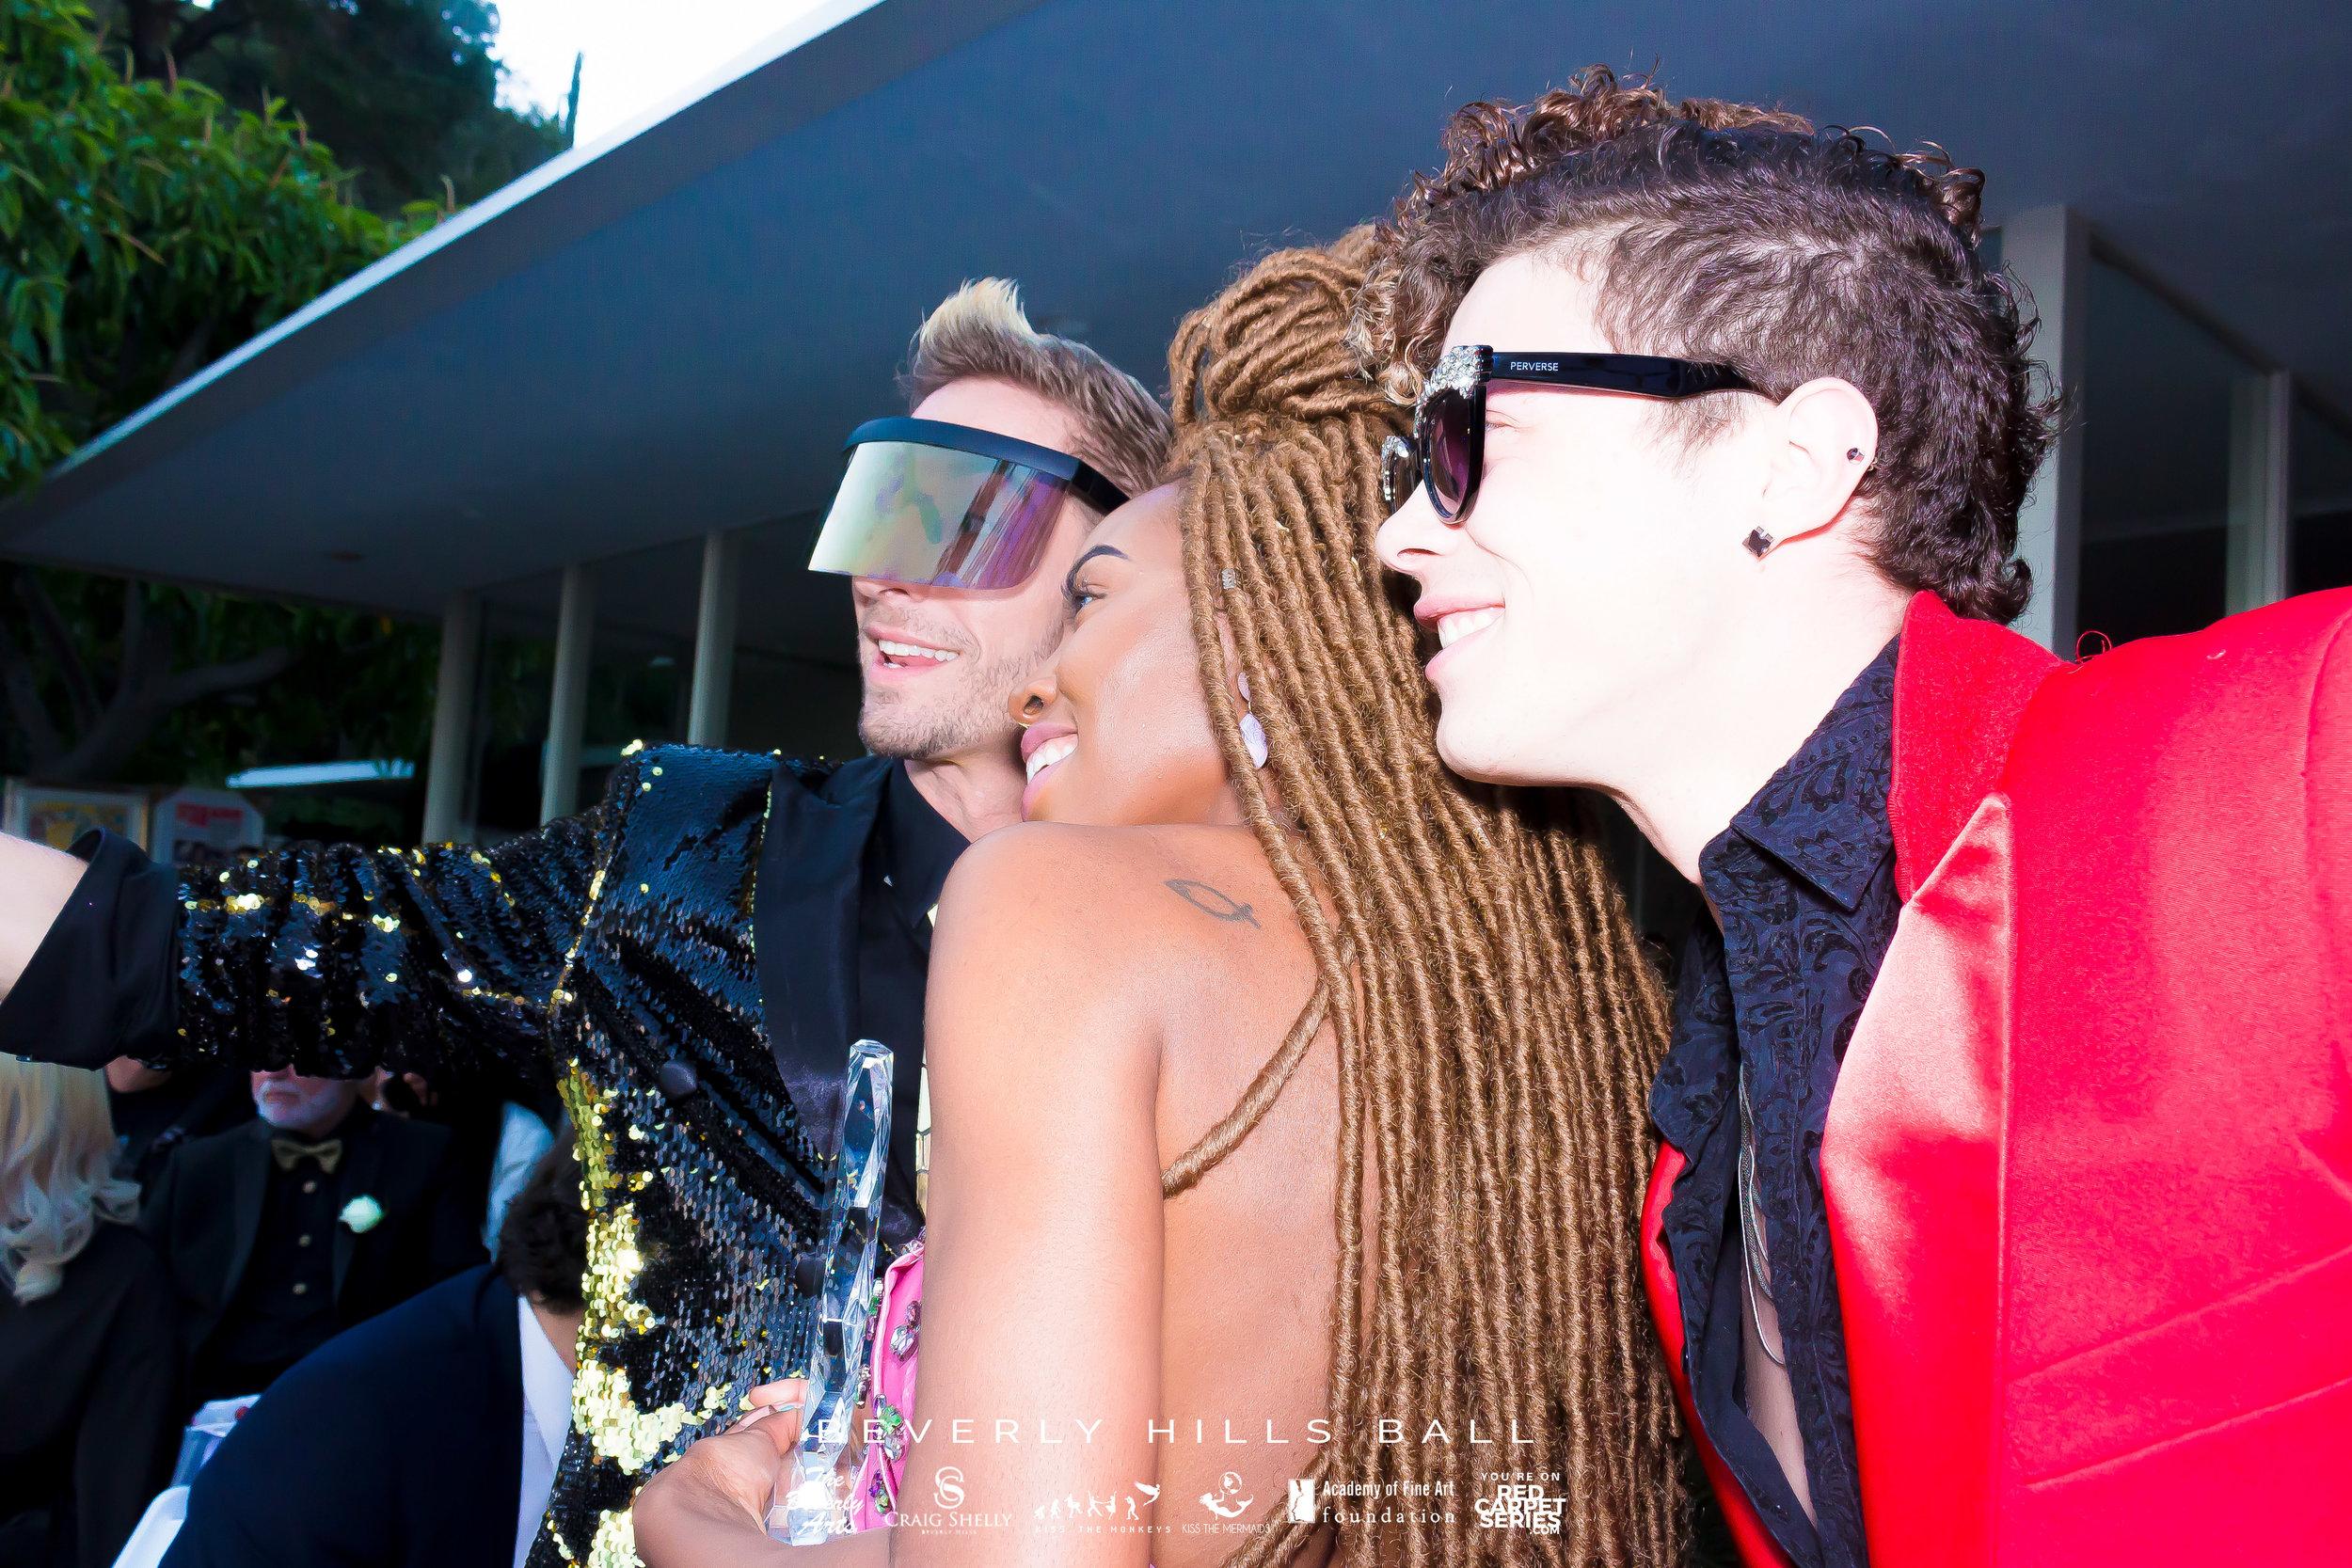 KTM - Beverly Hills Ball - 07-13-19 - Vol. 2_16.jpg